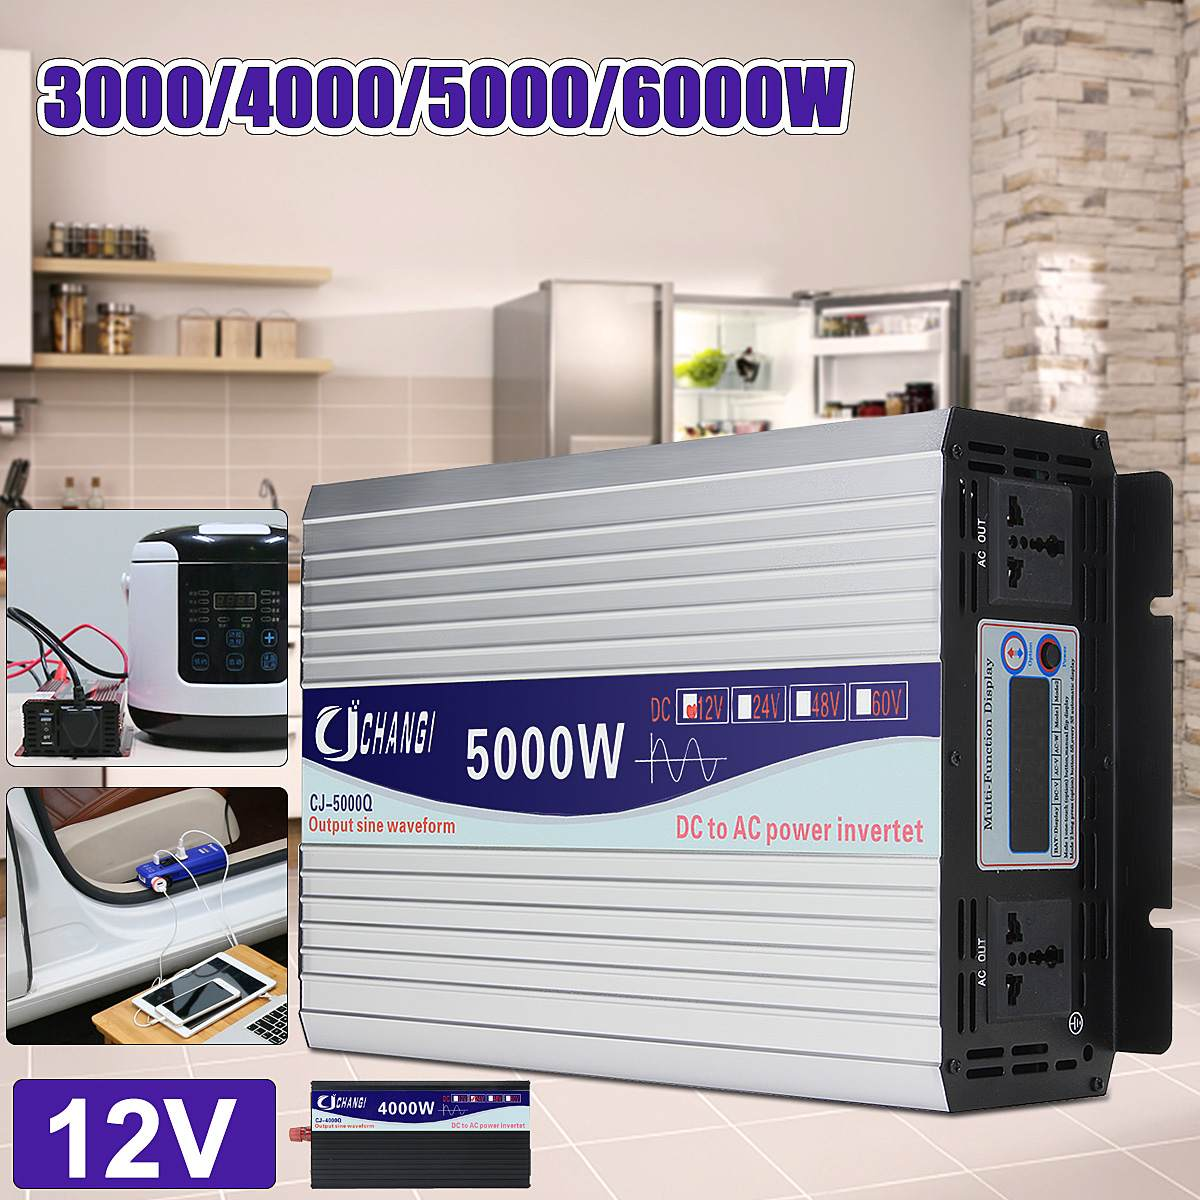 Intelligent Screen Pure Sine Wave Power Inverter 12V/24V To 220V 3000W/4000W/5000W/6000W Converter LCD Screen